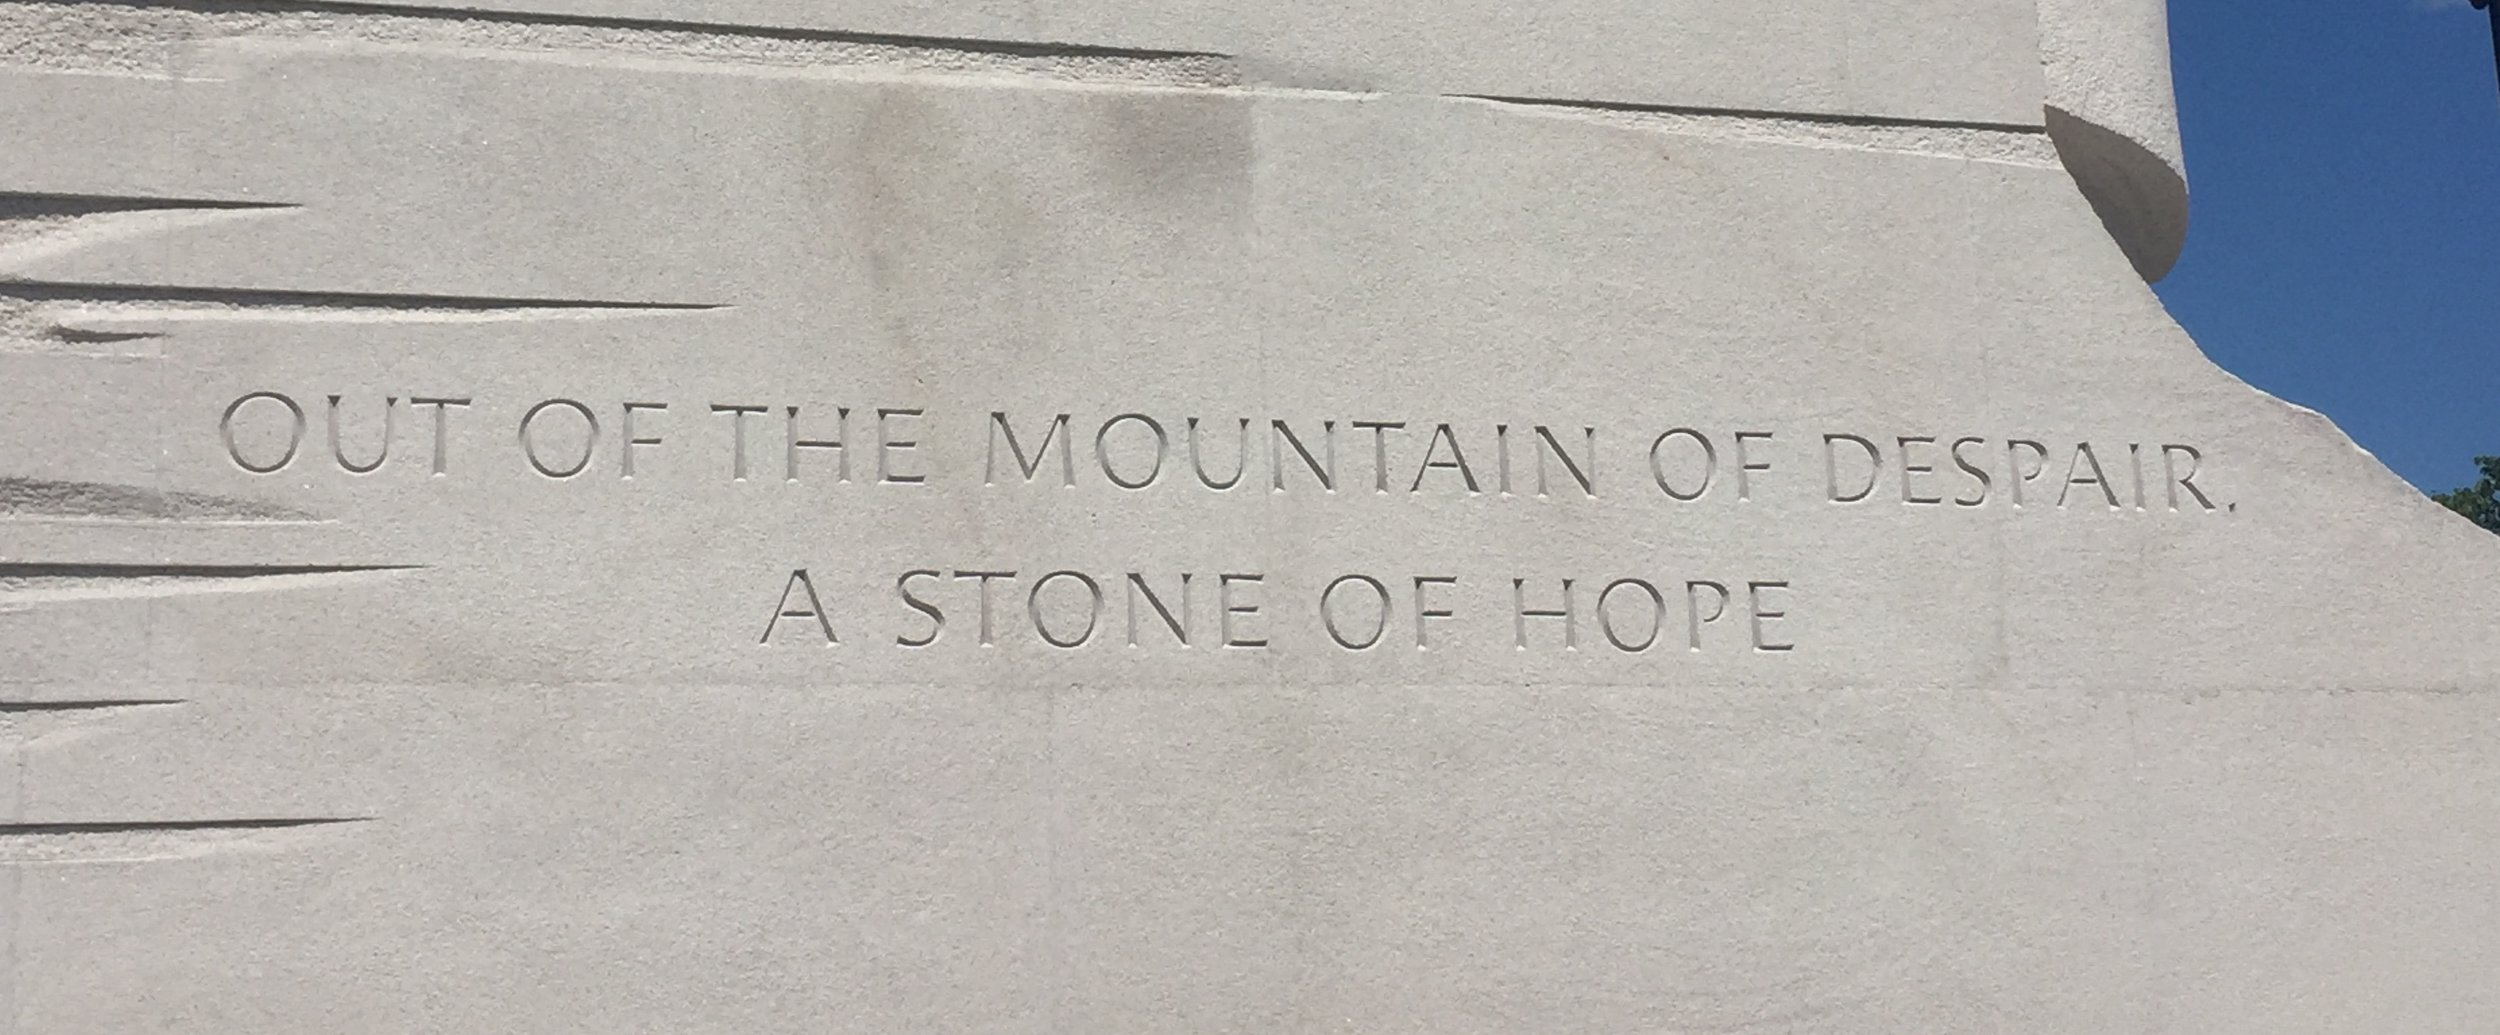 Dr. Martin Luther King, Jr. Memorial, Washington, D.C.